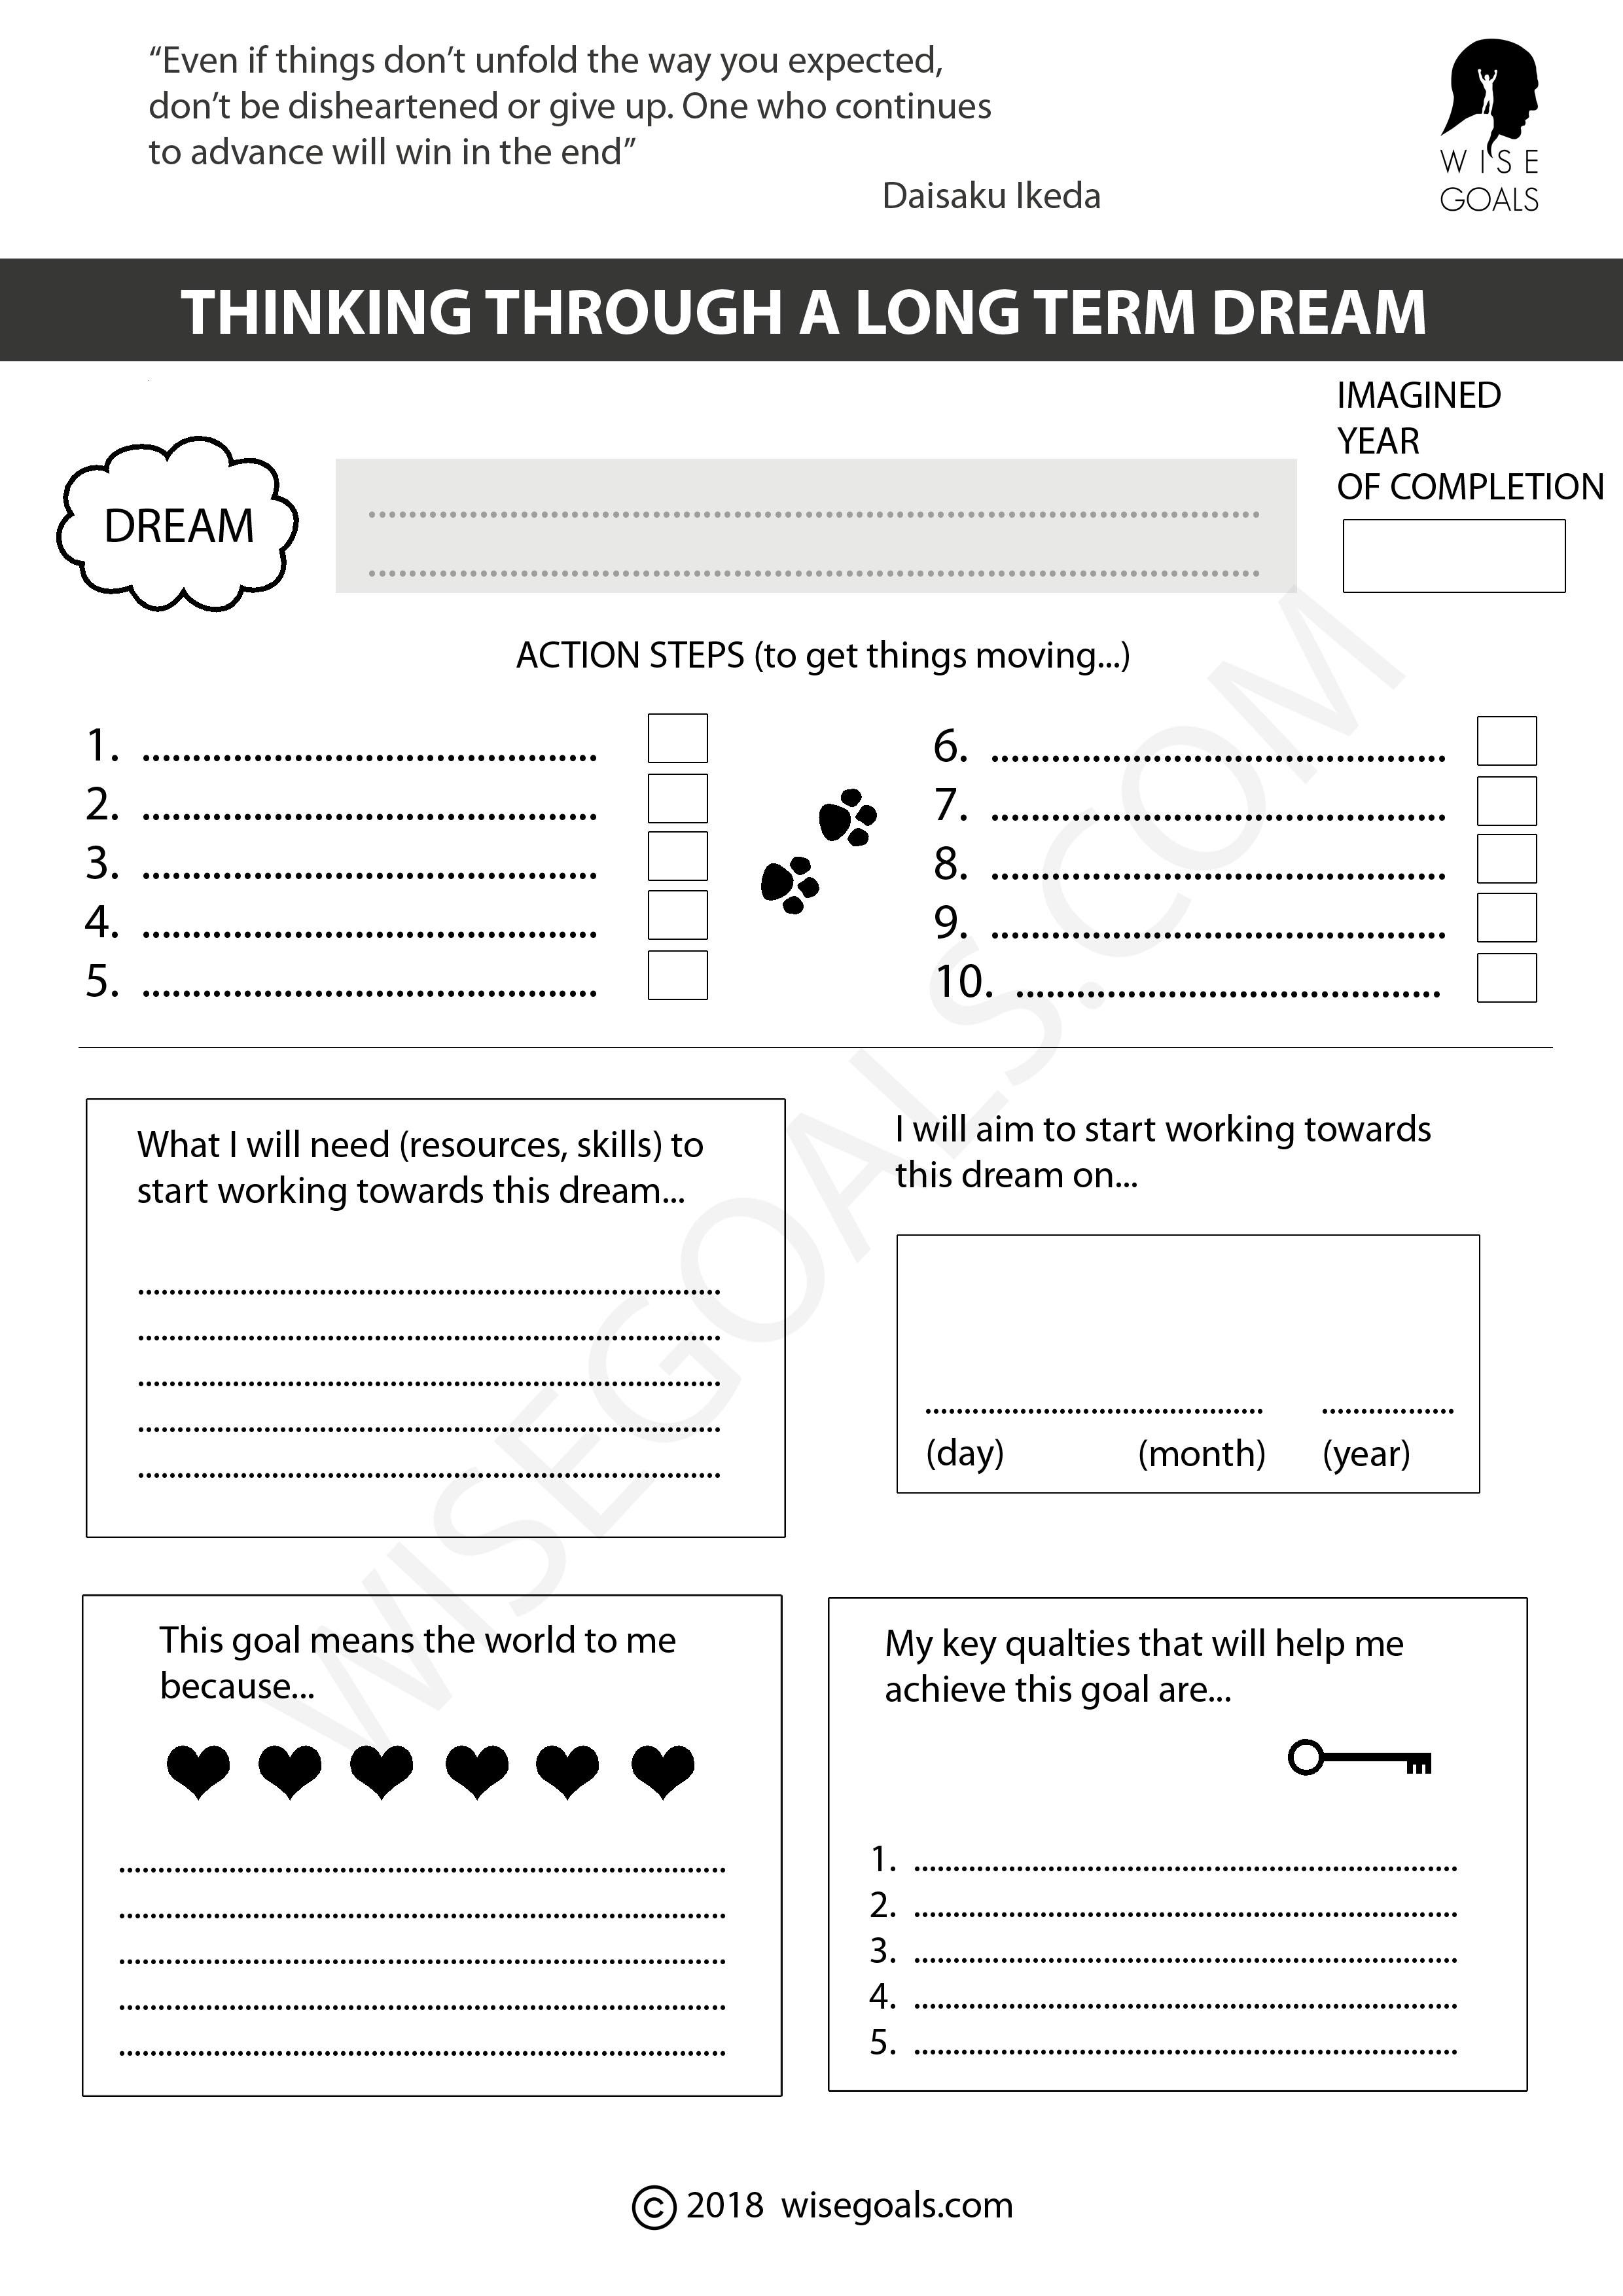 6 stylish goal setting worksheets to print pdf. Black Bedroom Furniture Sets. Home Design Ideas